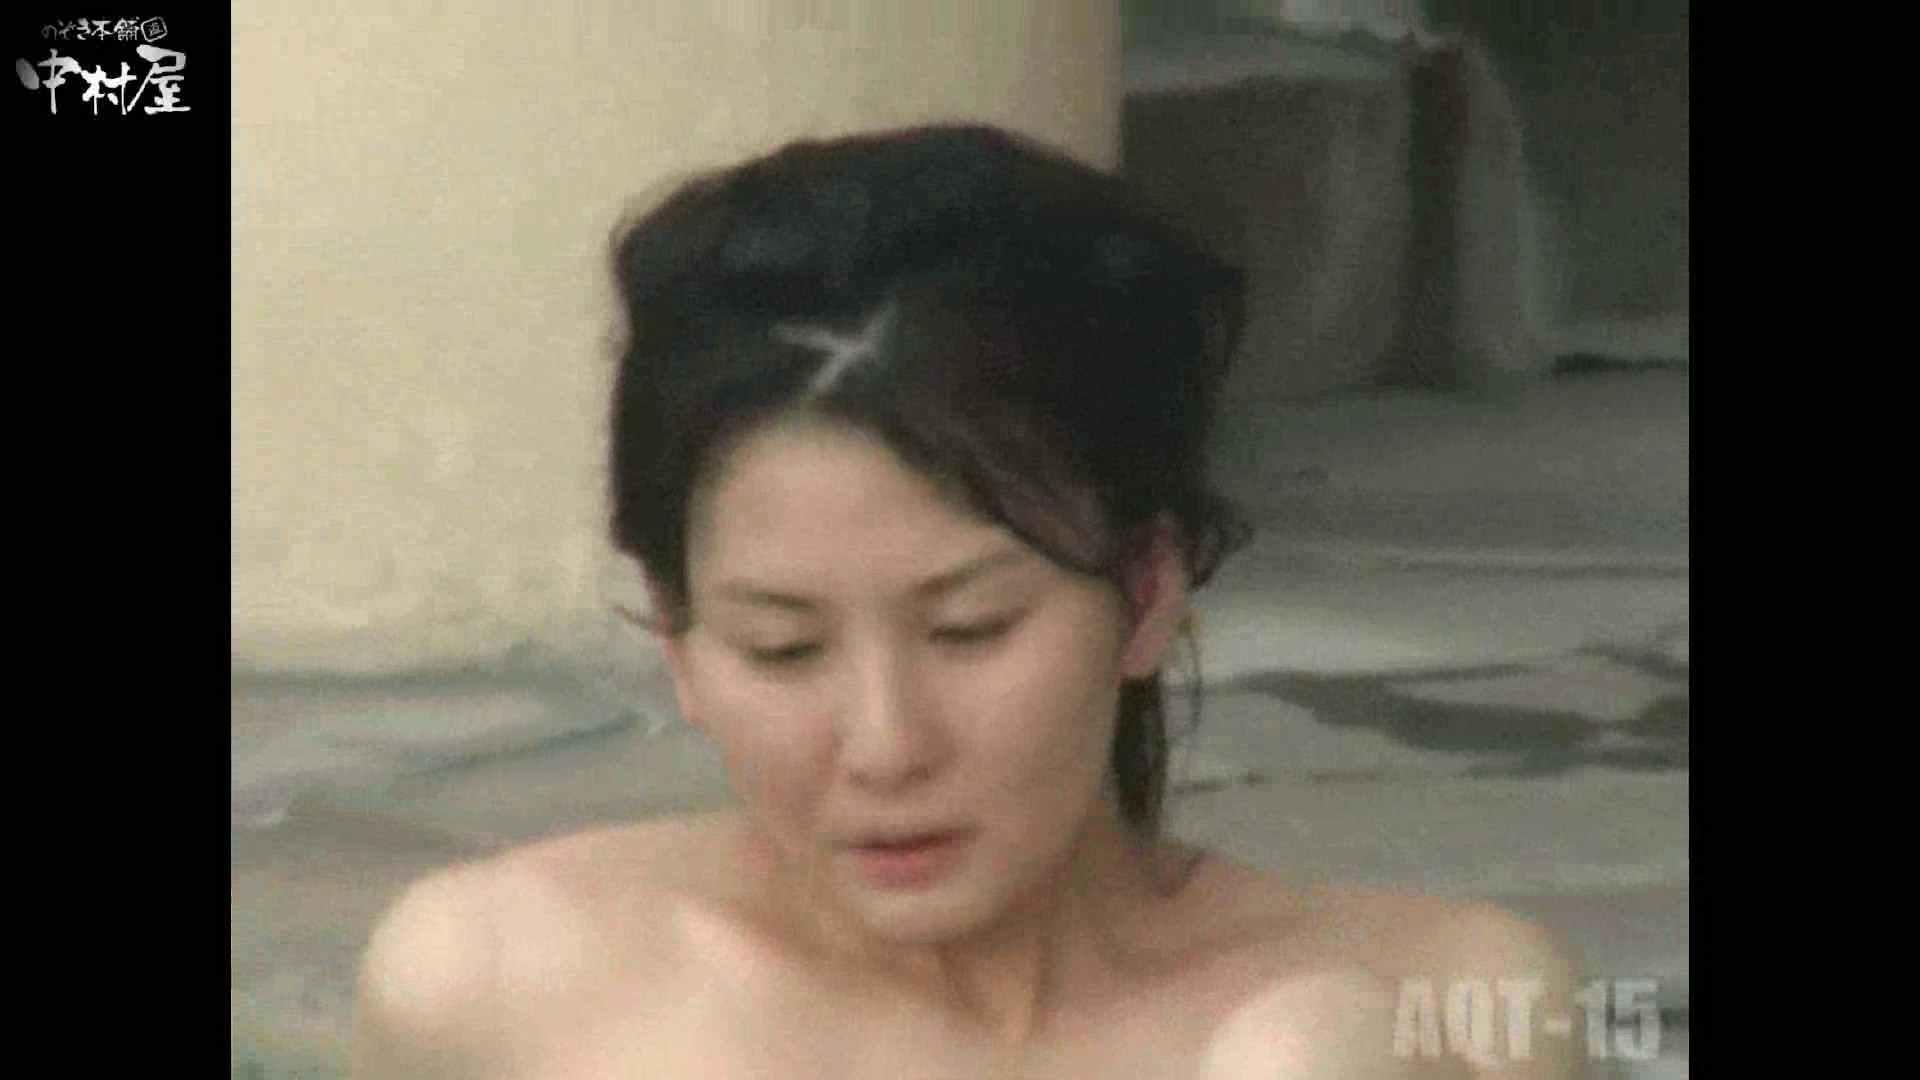 Aquaな露天風呂Vol.878潜入盗撮露天風呂十五判湯 其の二 OL女体 | 女体盗撮  69連発 9